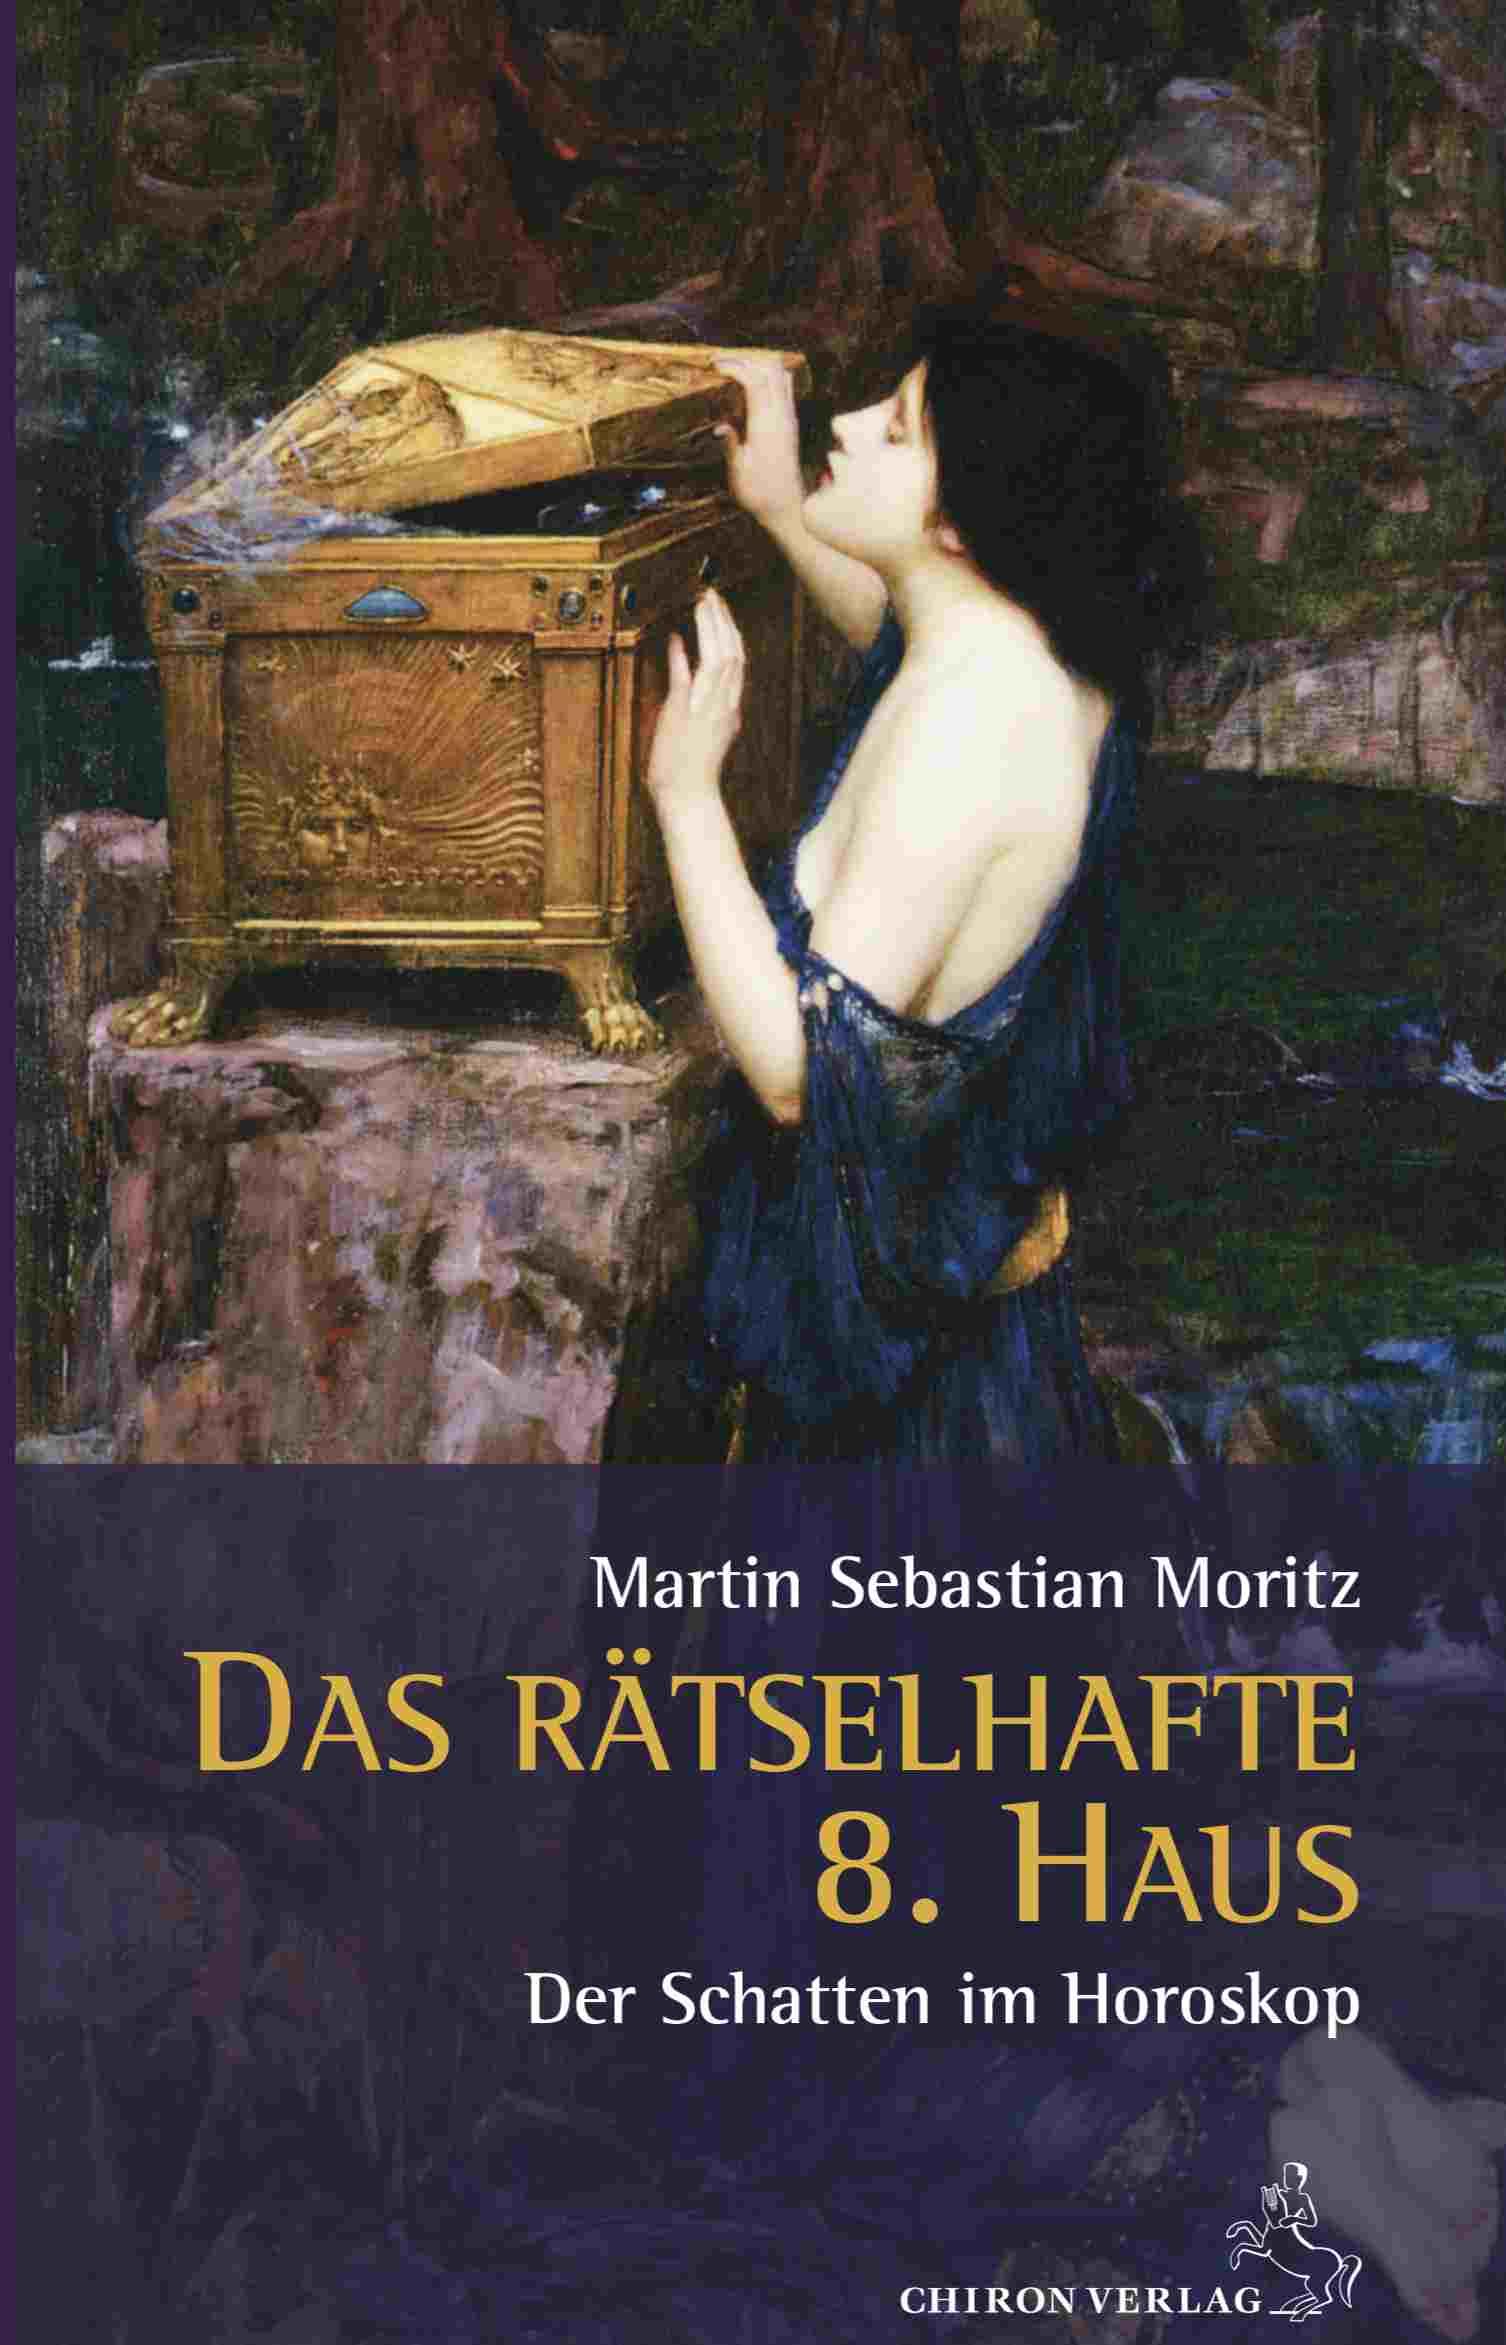 Das rätselhafte 8.Haus Der Schatten im Horoskop Martin Sebastian Moritz Berlin Hamburg